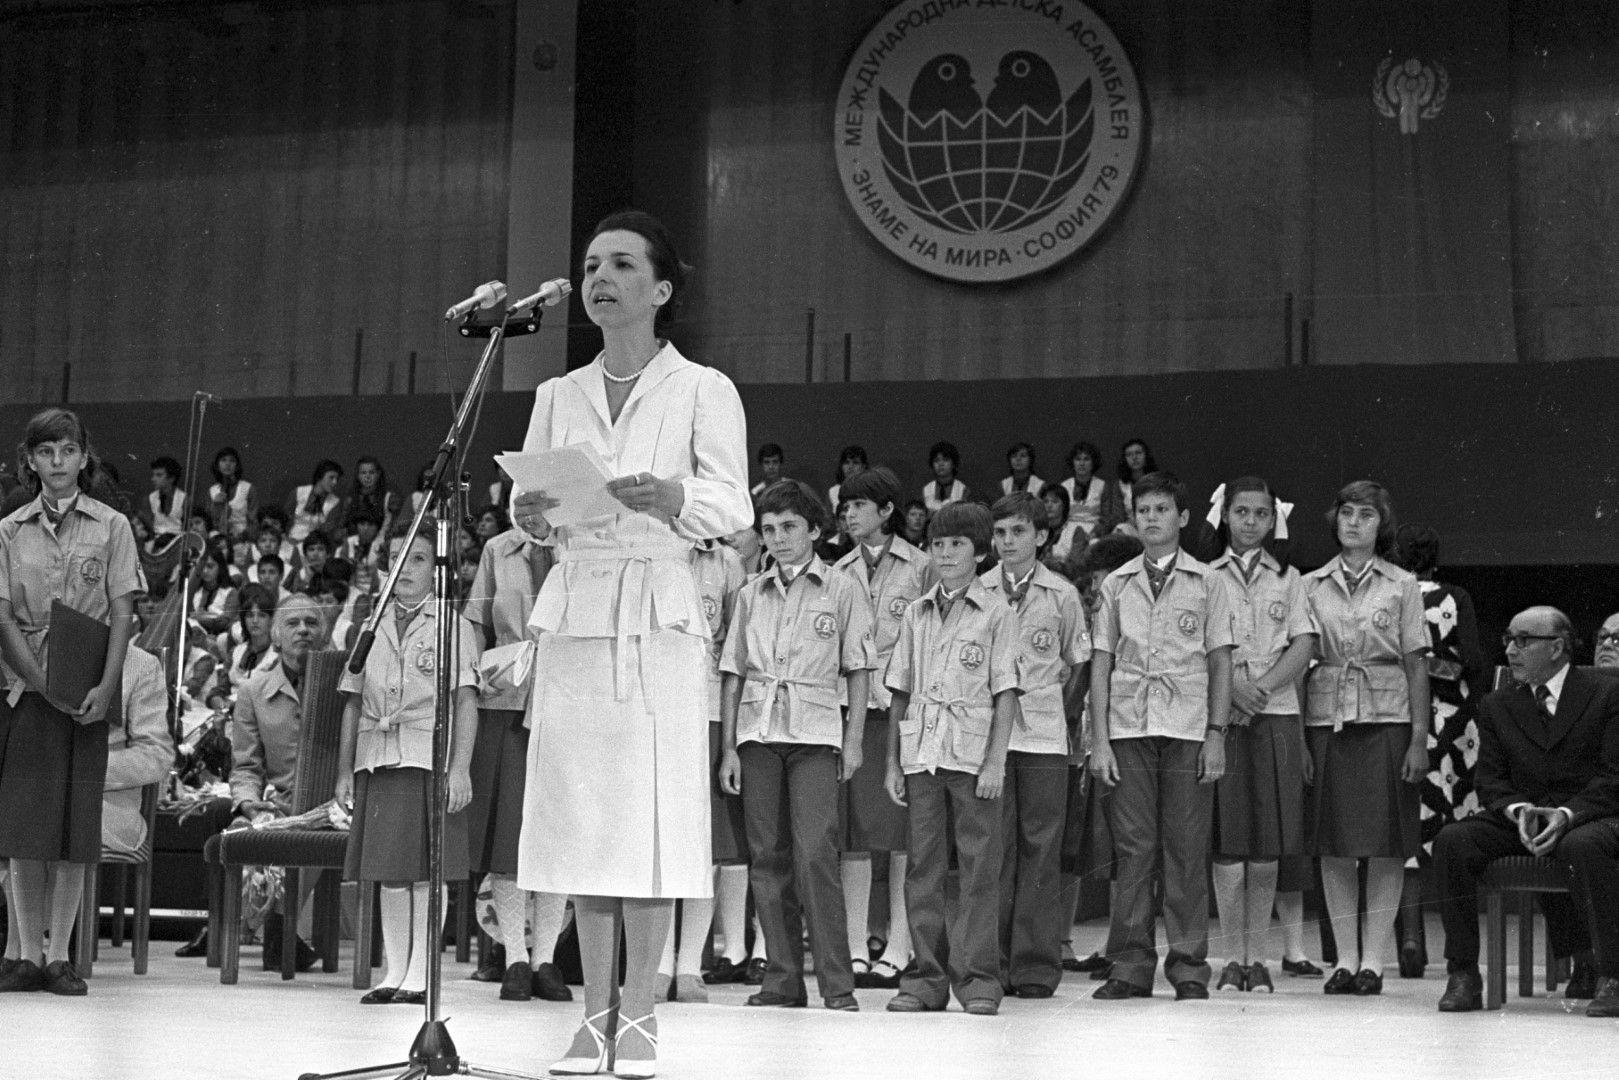 """Знаме на мира "" е организирана по инициатива на председателя на Комитета за култура Людмила Живкова"